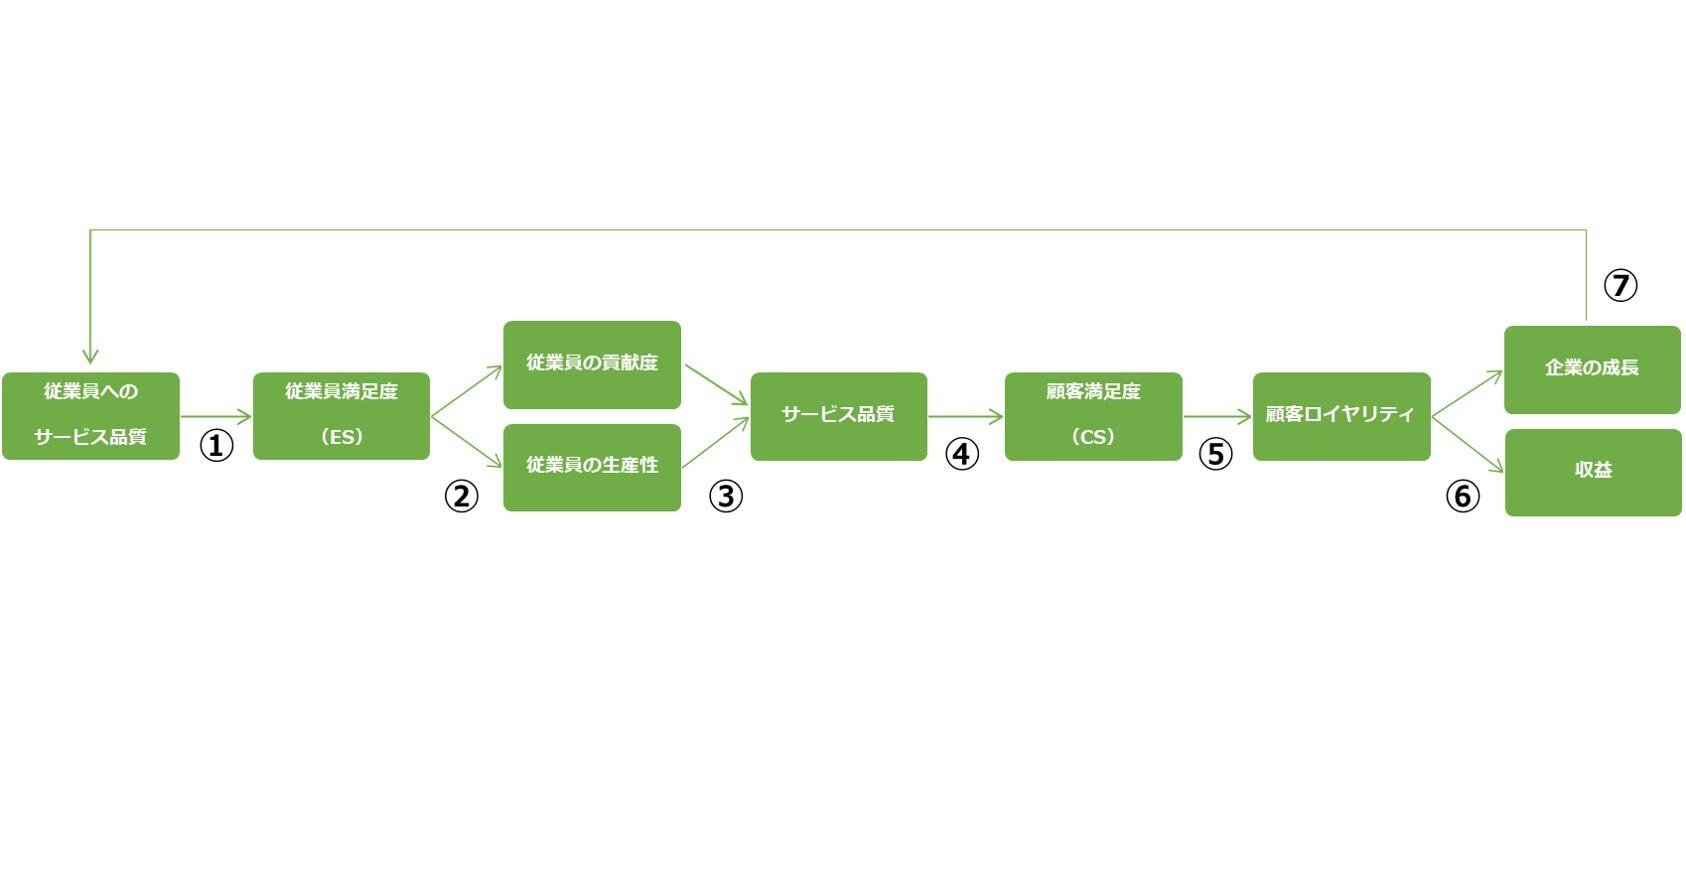 SPC(サービス・プロフィット・チェーン)を産む7つのステップ